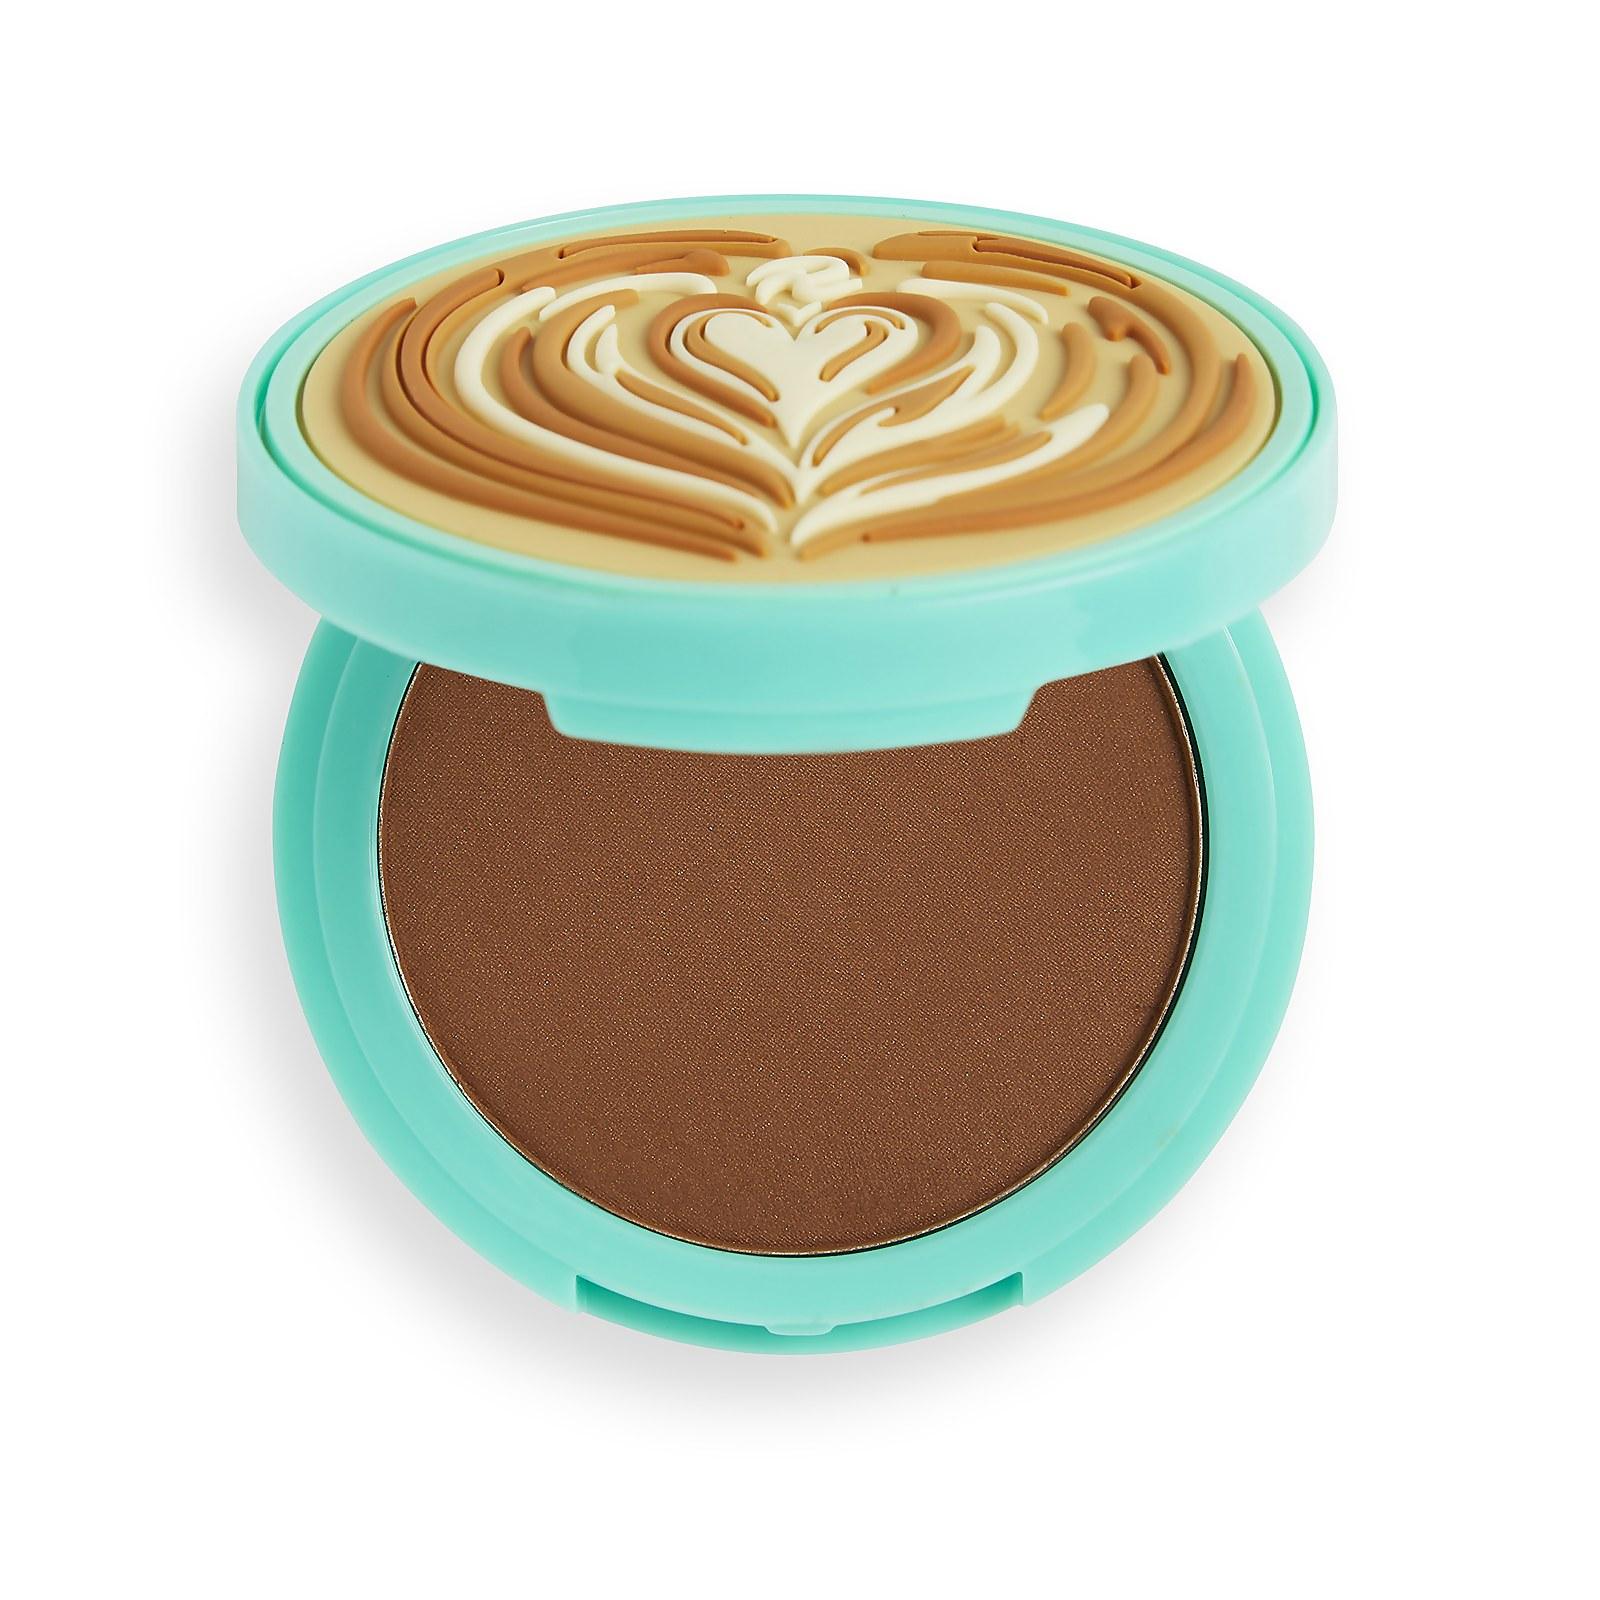 Купить Бронзер Revolution I Heart Revolution Tasty Coffee Bronzer - Мокко